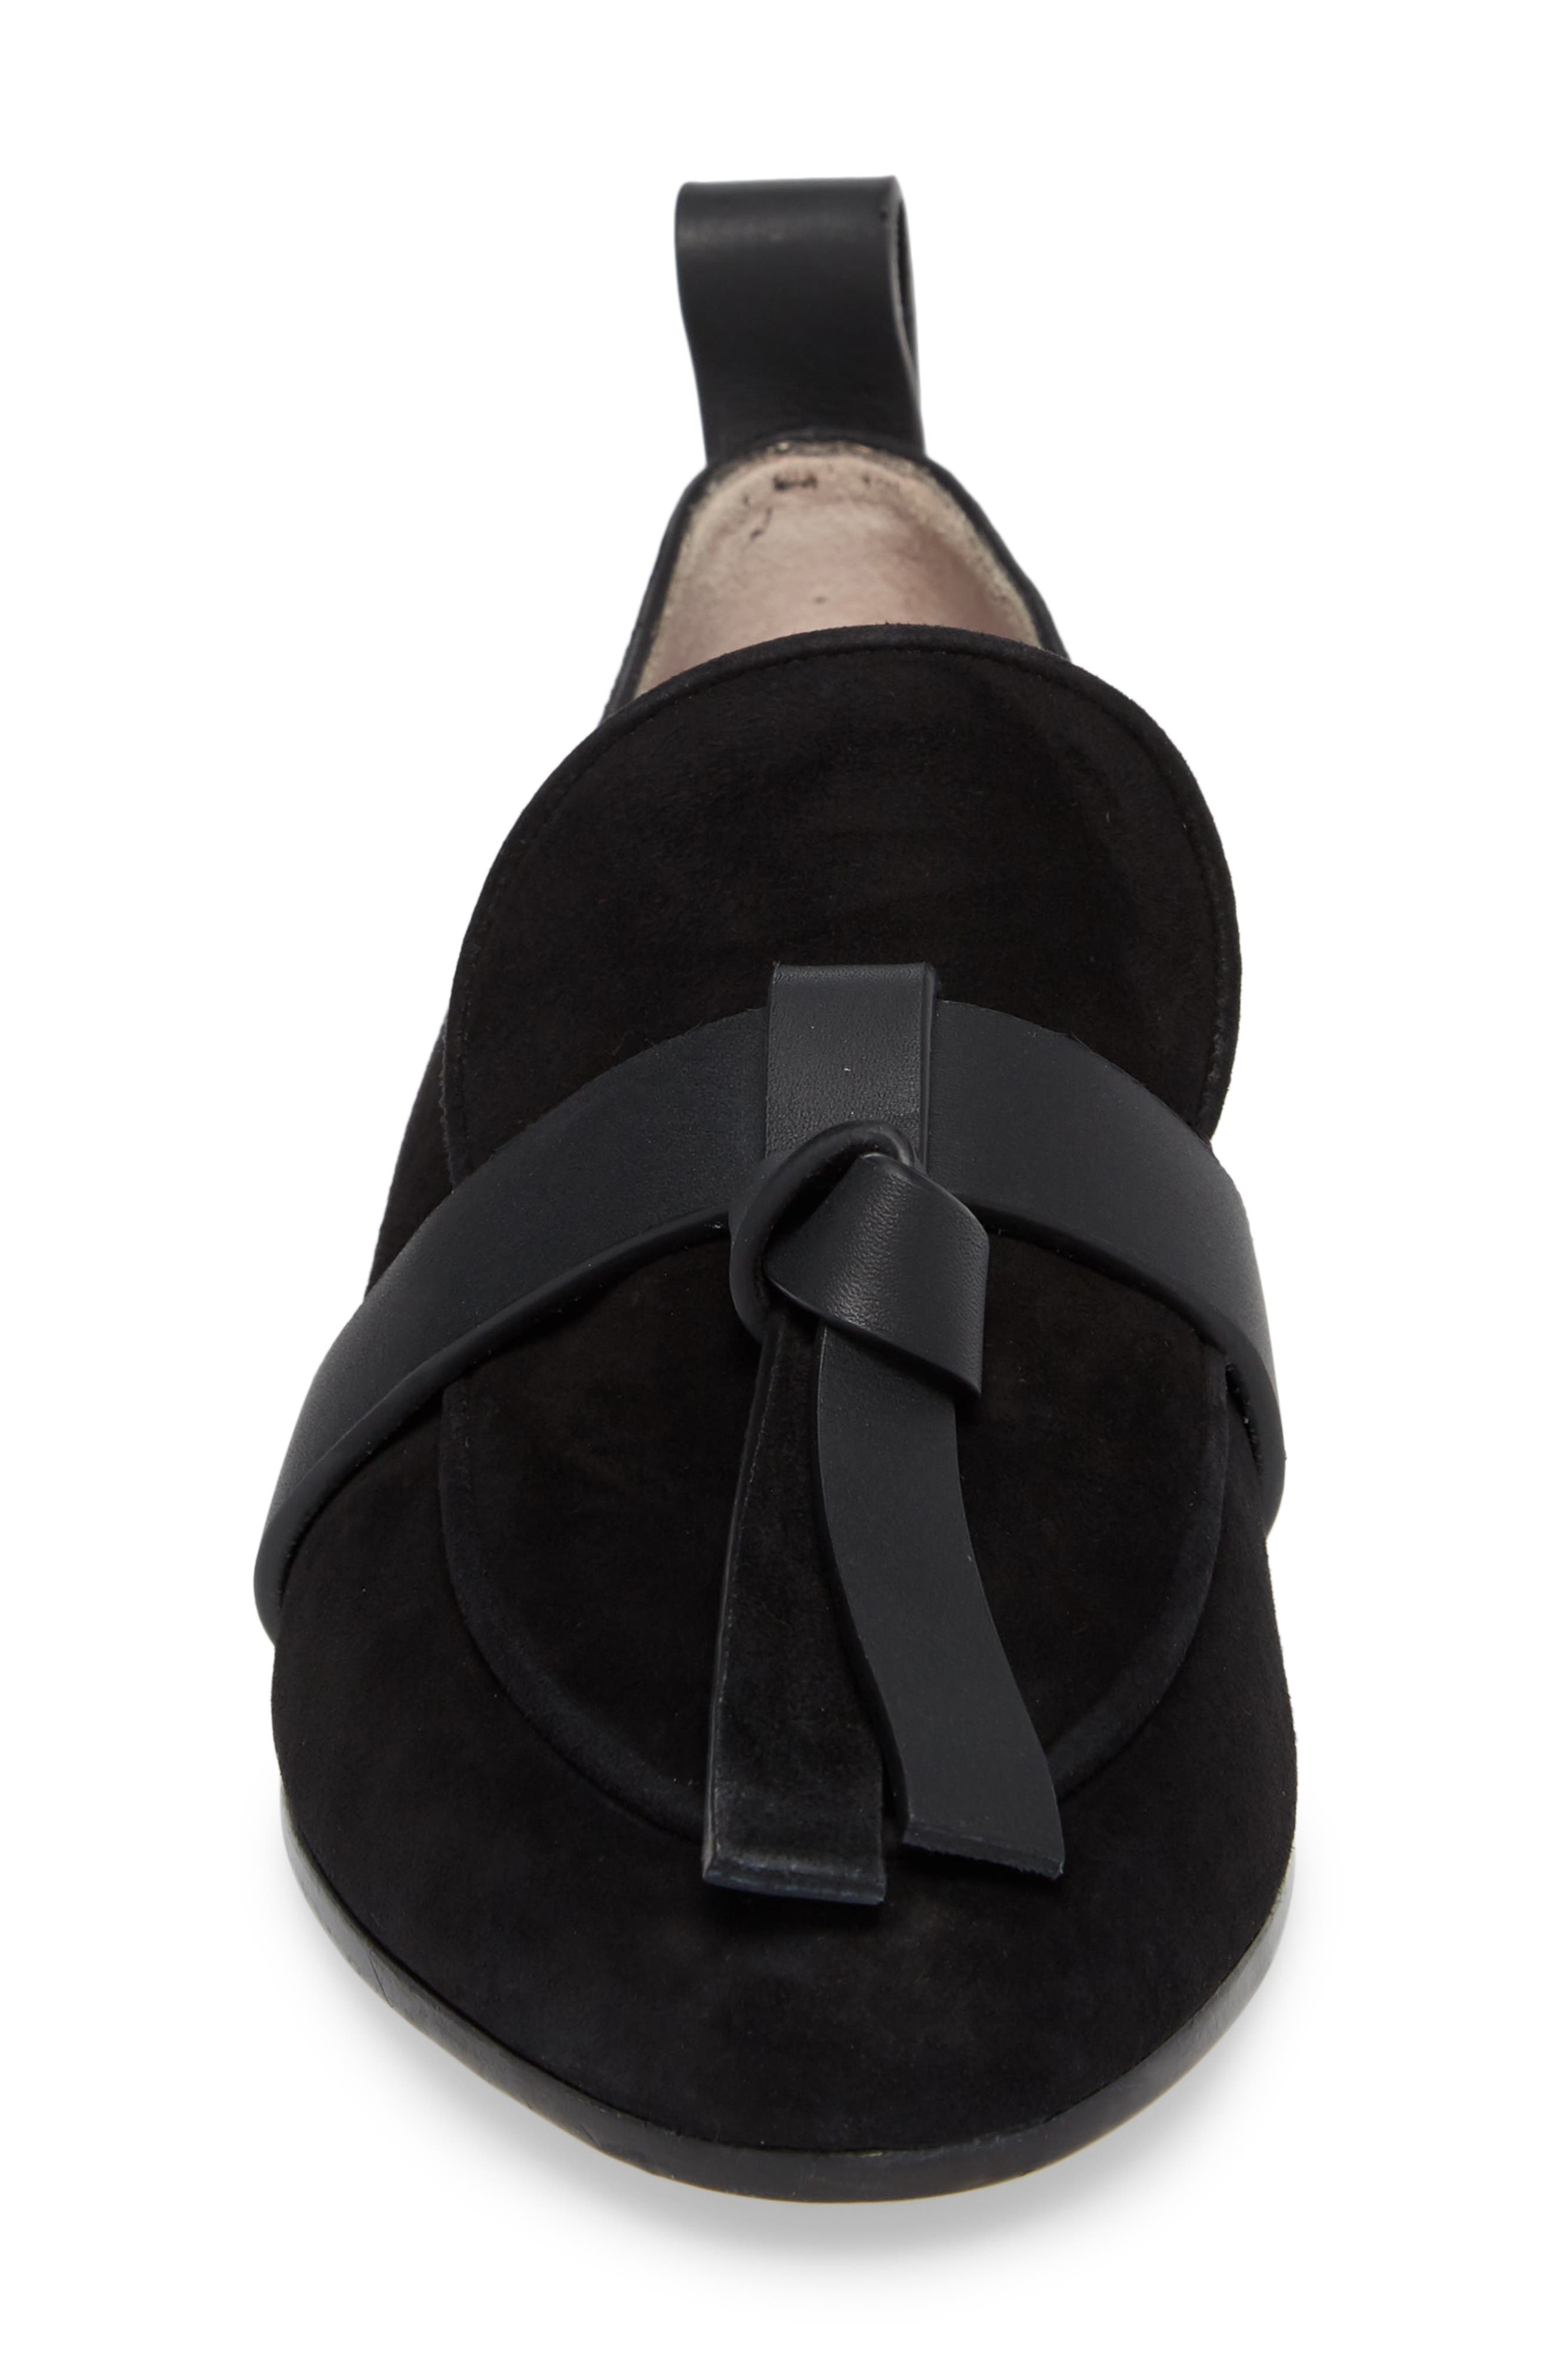 Prescott Knotted Loafer,                             Alternate thumbnail 4, color,                             Black Suede